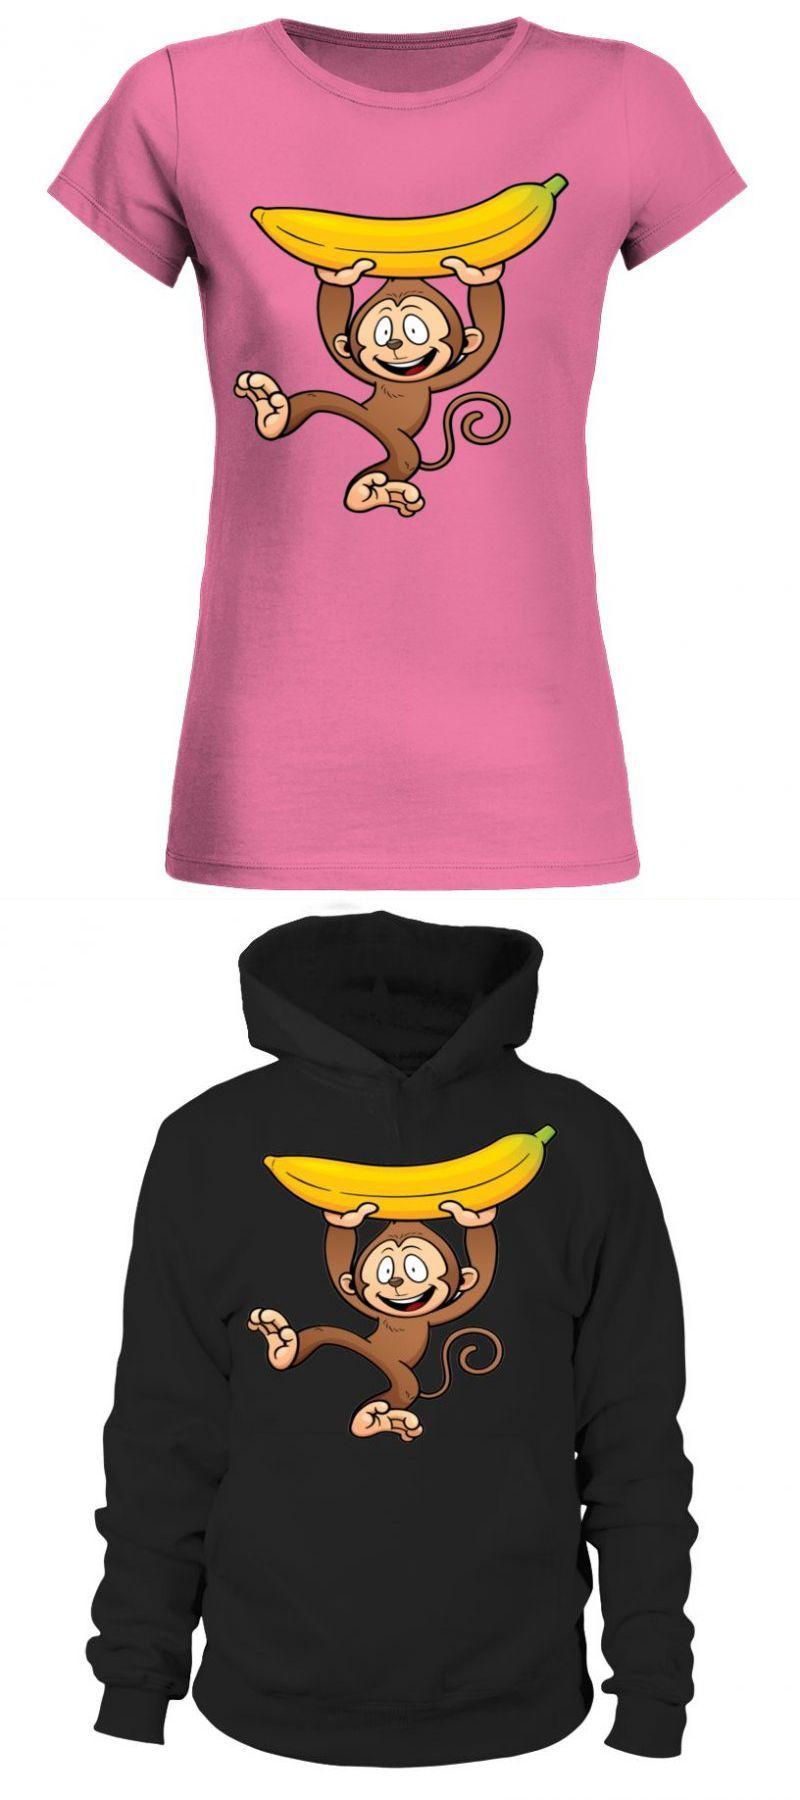 Gas monkey garage t shirt cartoon monkey holding banana puppy monkey baby t shirt #gasmonkeygarage